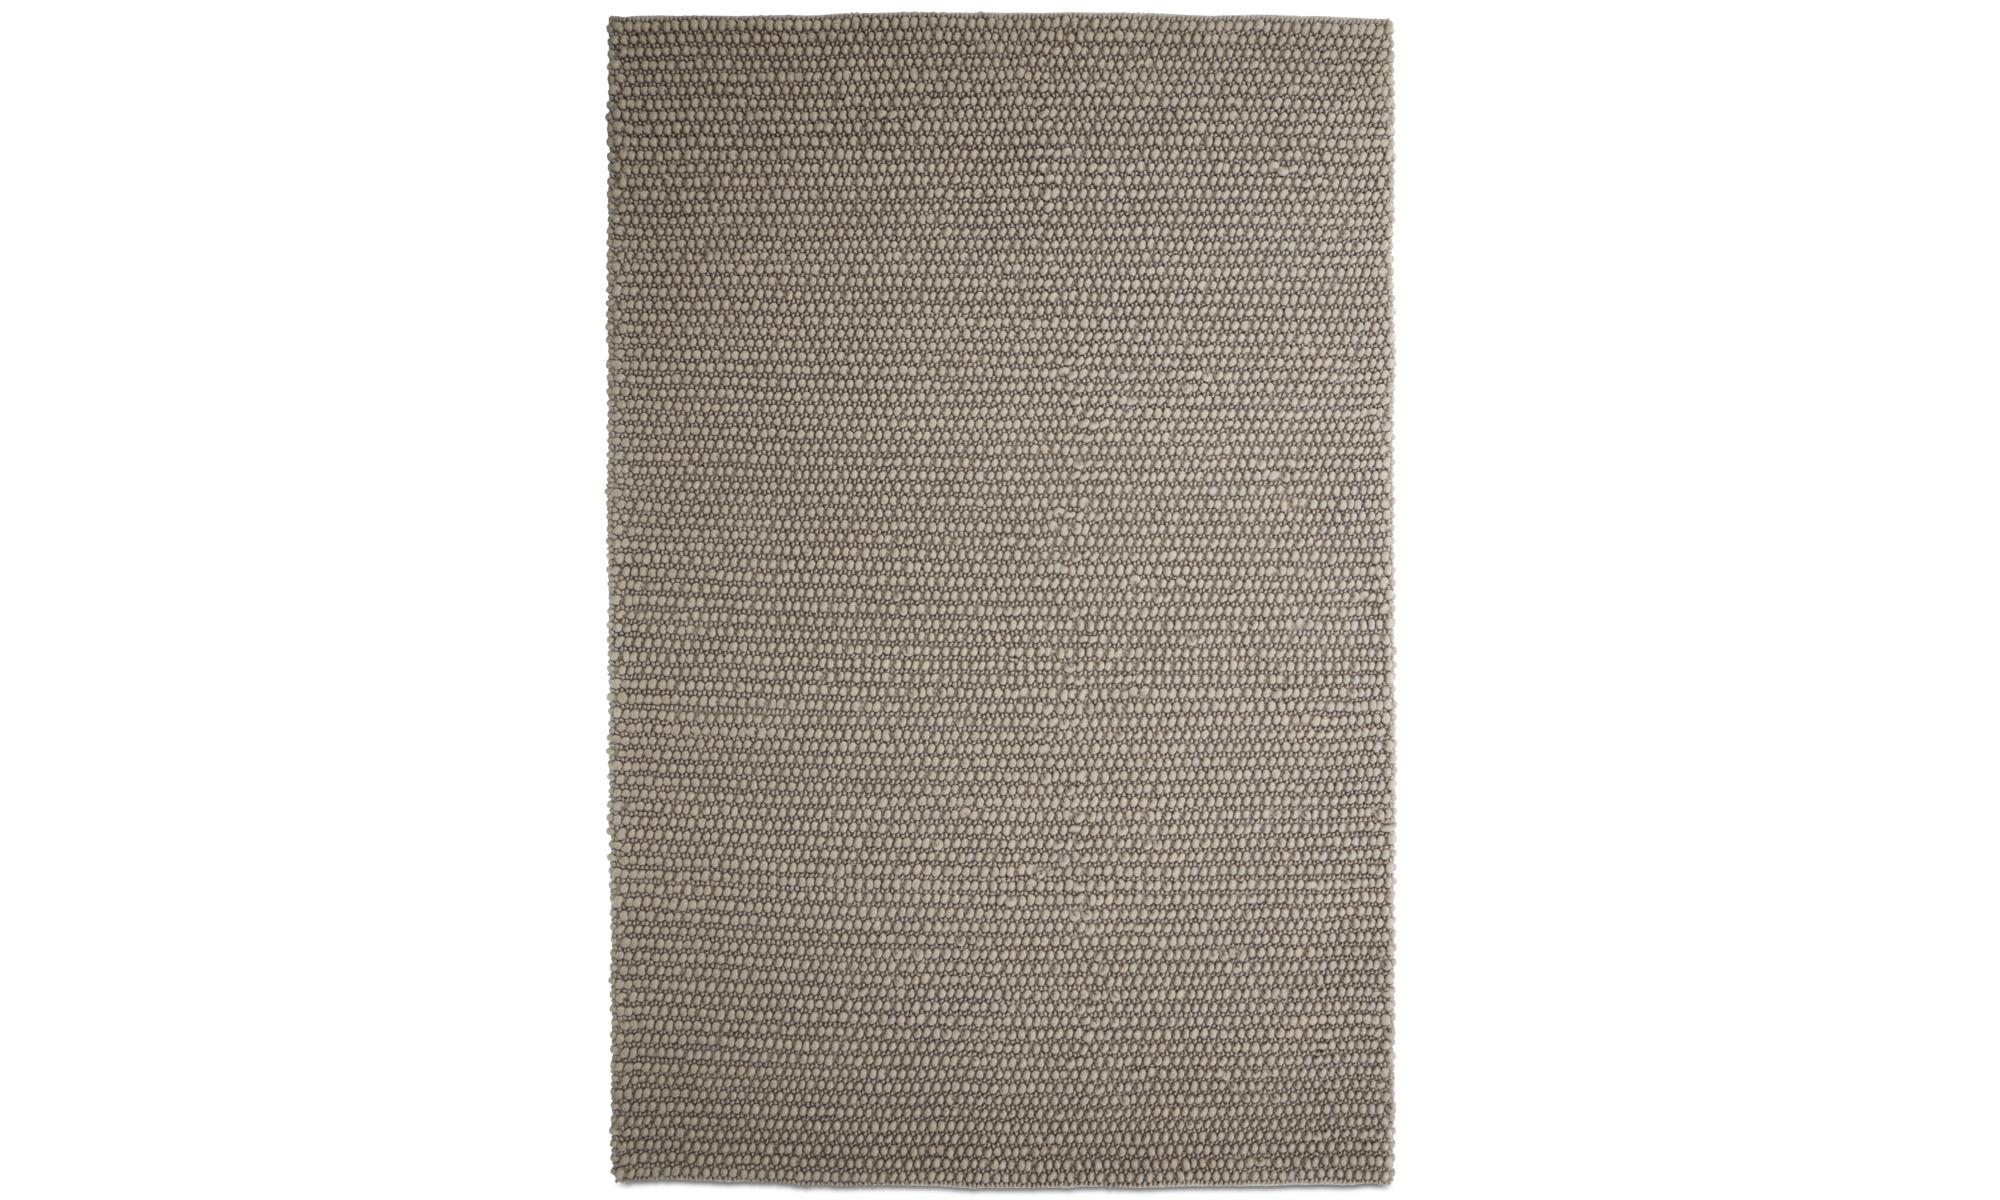 Rugs - Nordic rug - rectangular - Grey - Wool